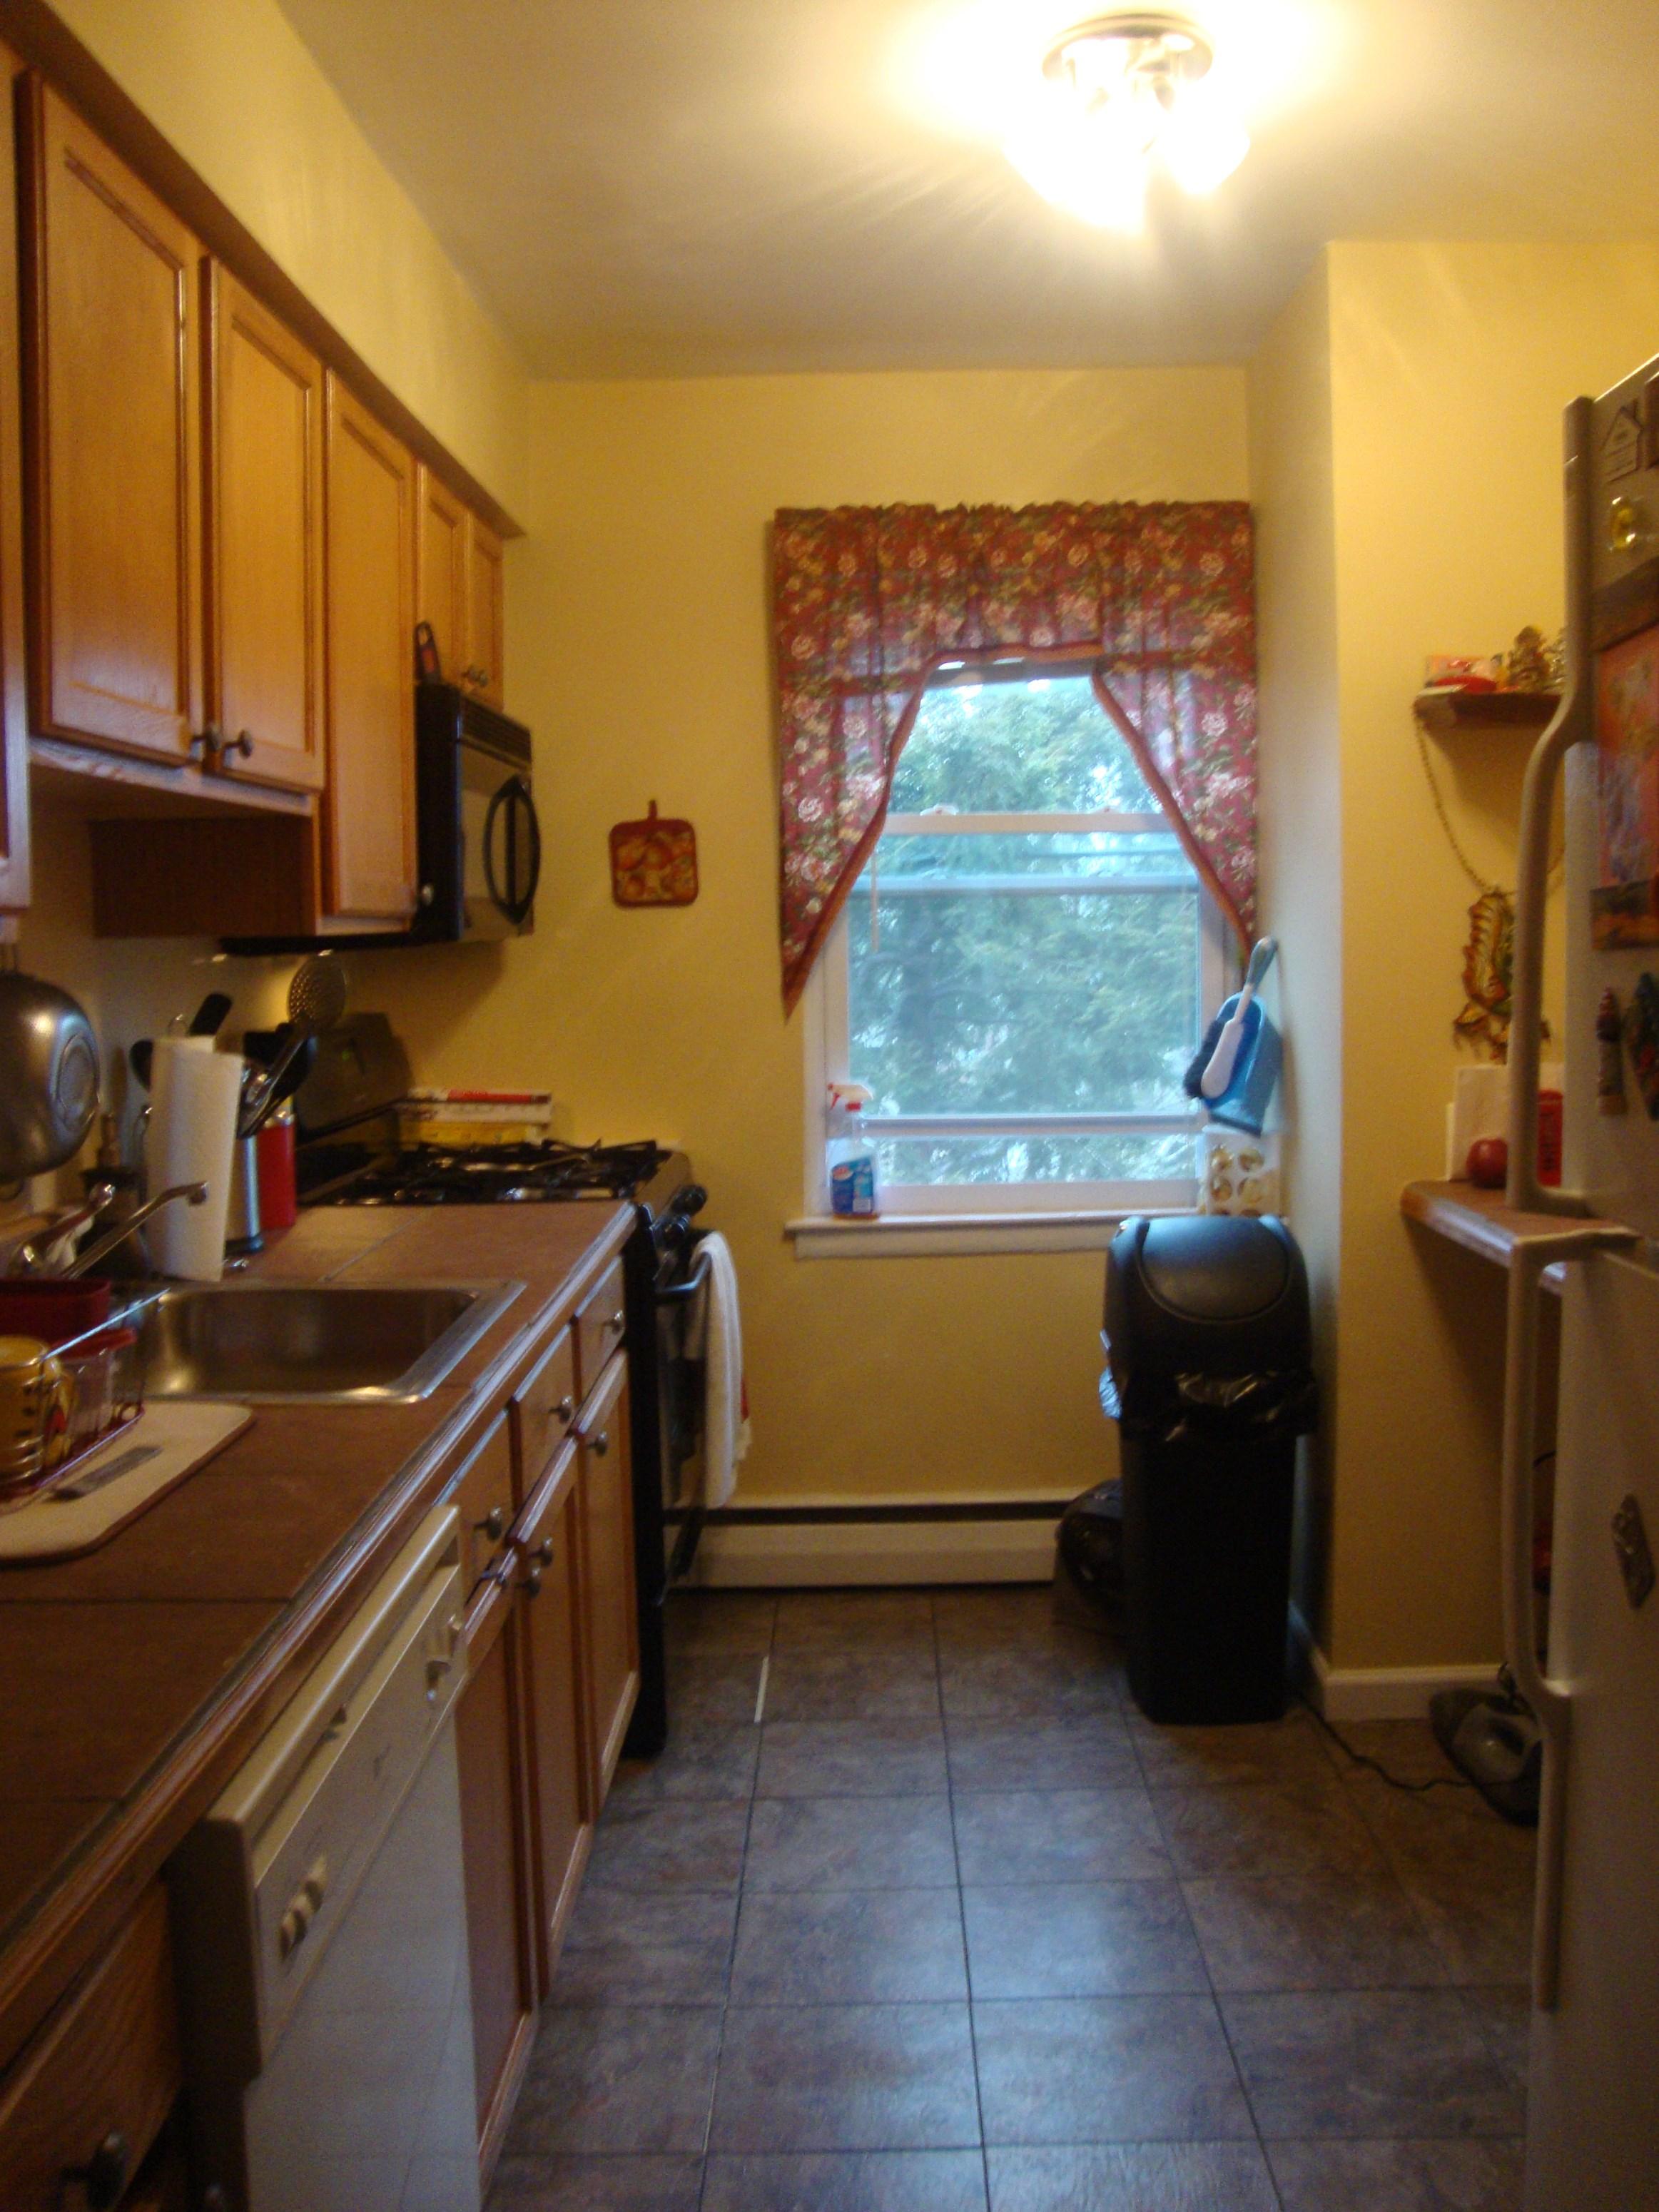 2 Bedroom House For Rent In Edison NJ Two Bedroom Homes For Rental Sulek